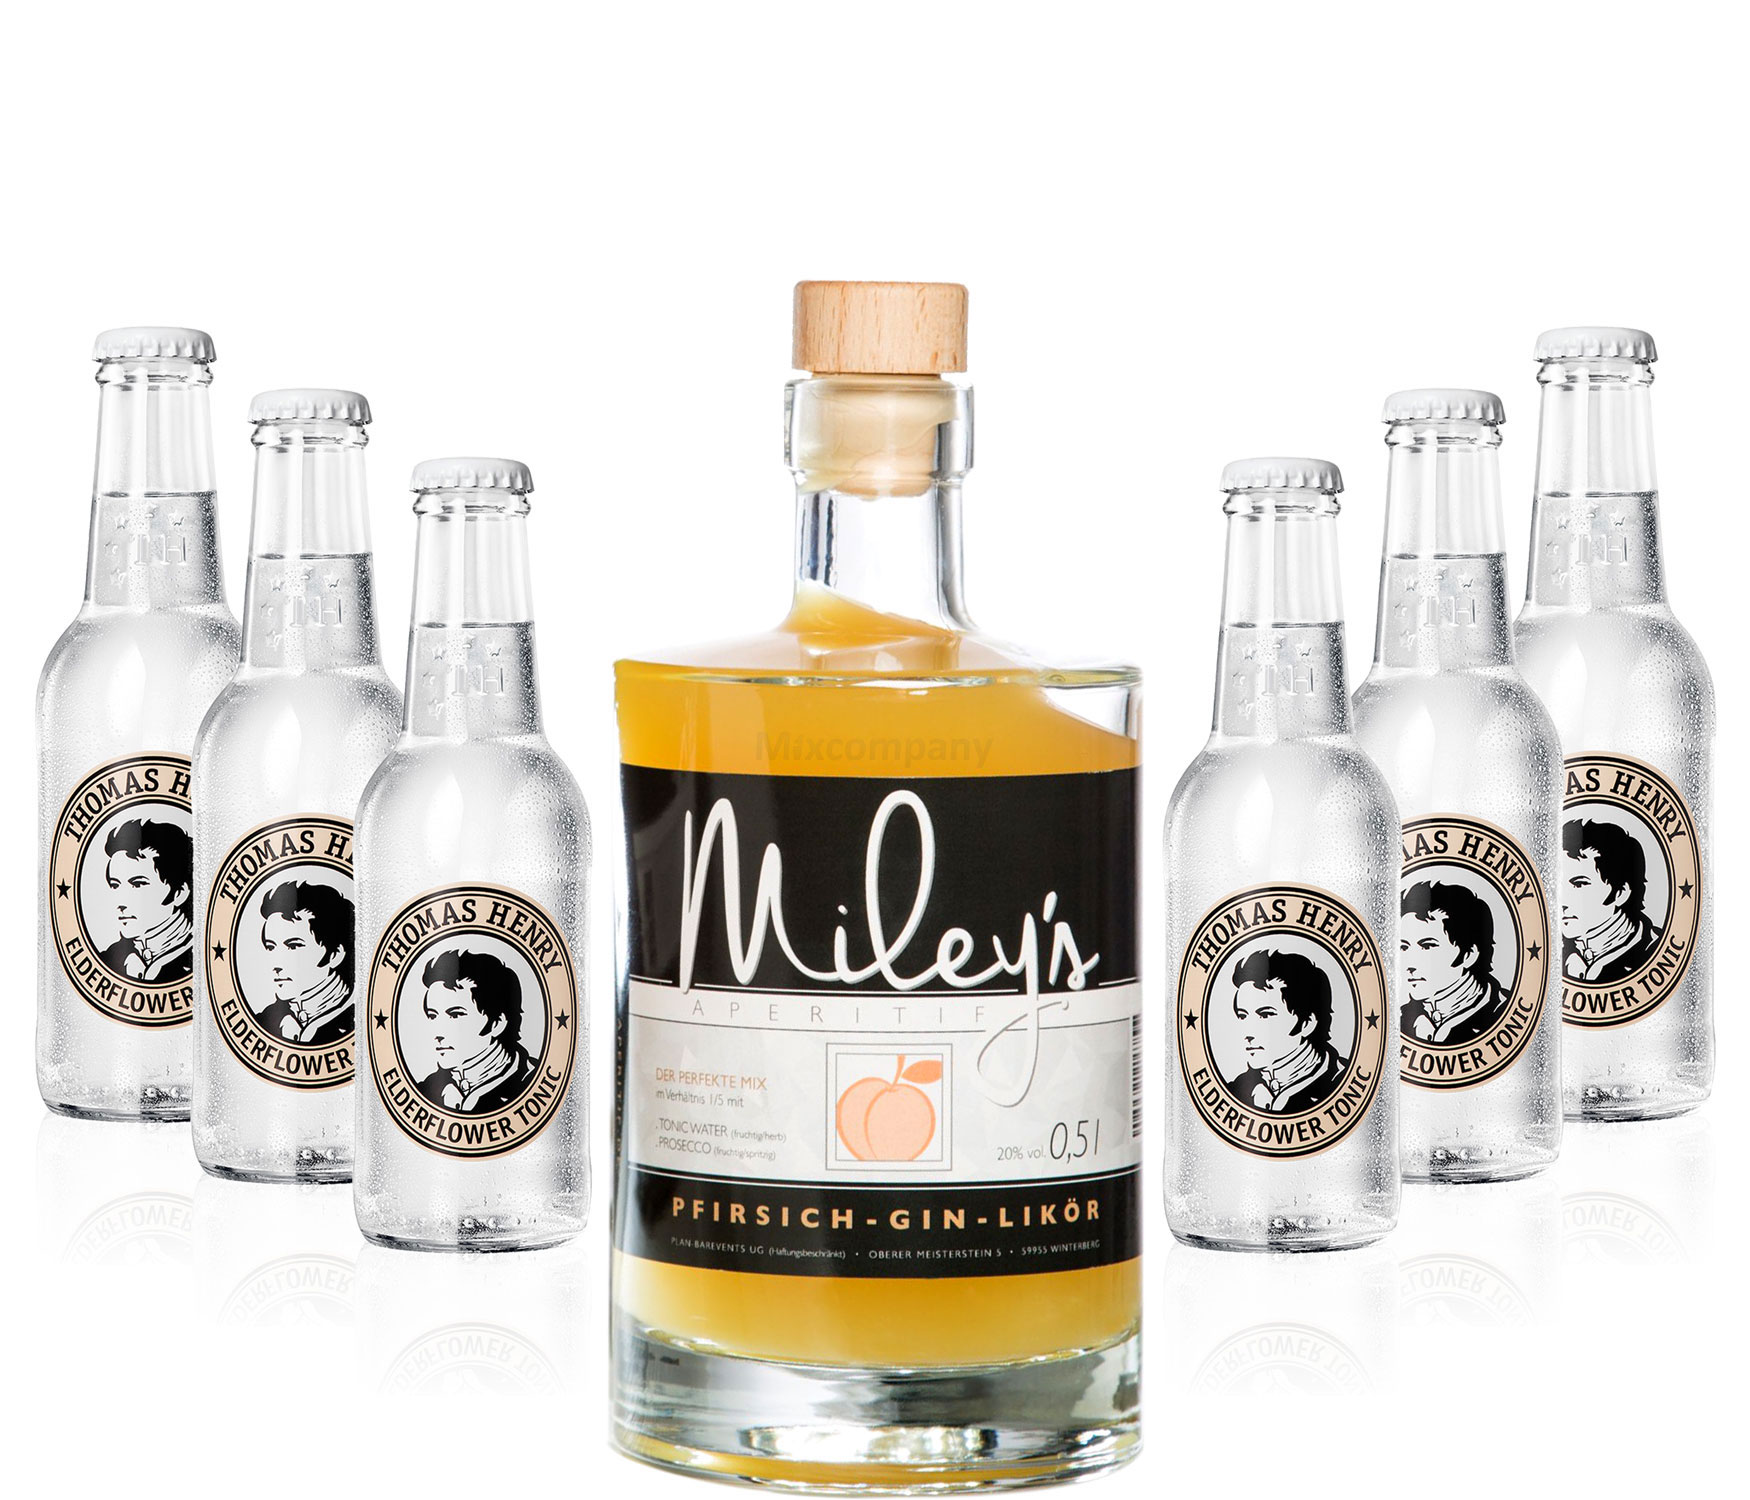 Mileys Pfirsich Gin Likör 0,5l (20% Vol) + 6x Thomas Henry Elderflower Tonic Water 200ml inkl. Pfand MEHRWEG -[Enthält Sulfite]